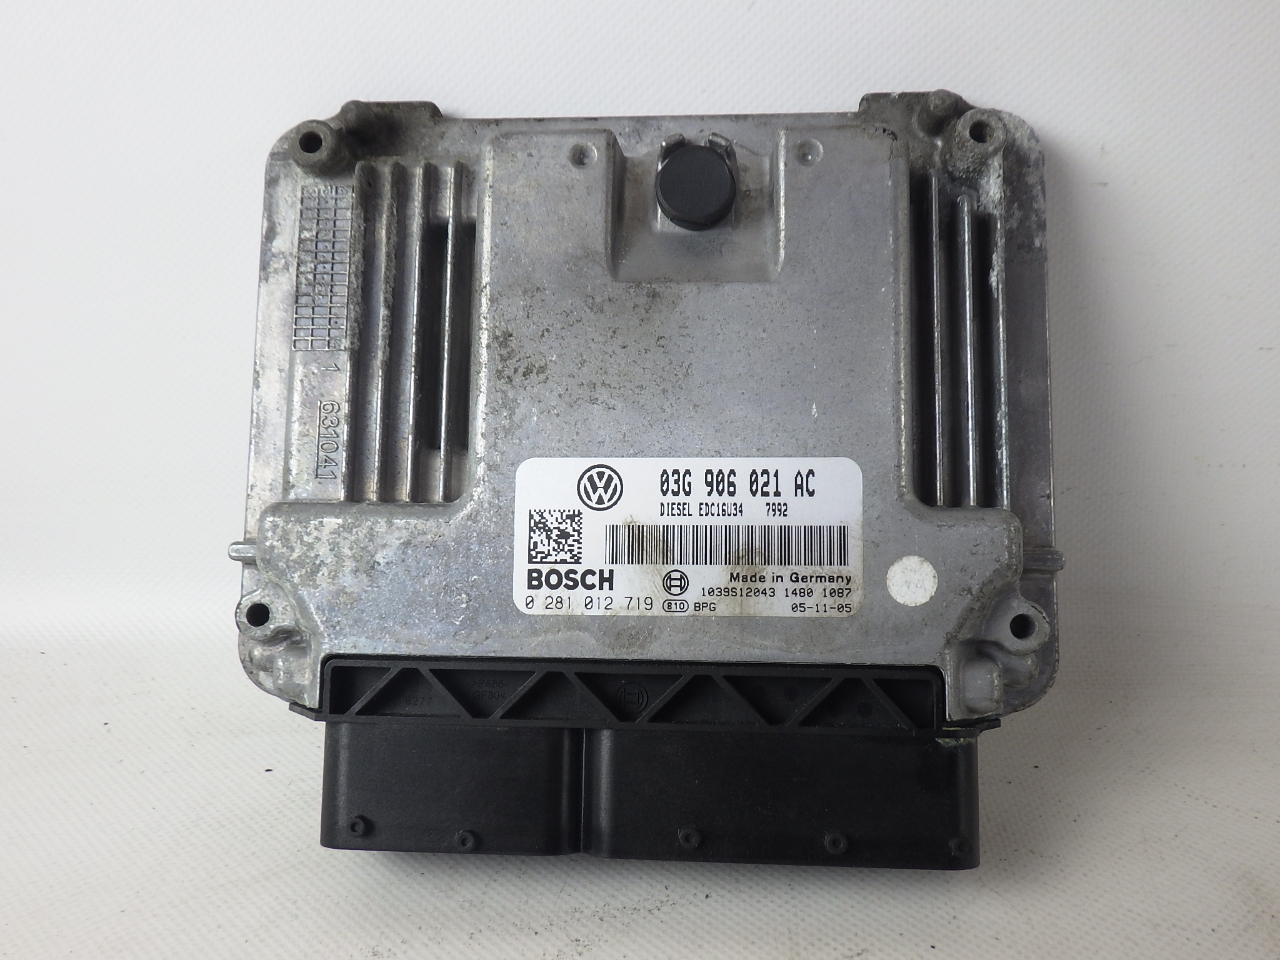 03g906021ac ecu control unit engine vw passat variant 3c5 b6 2 0 tdi 103 kw ebay